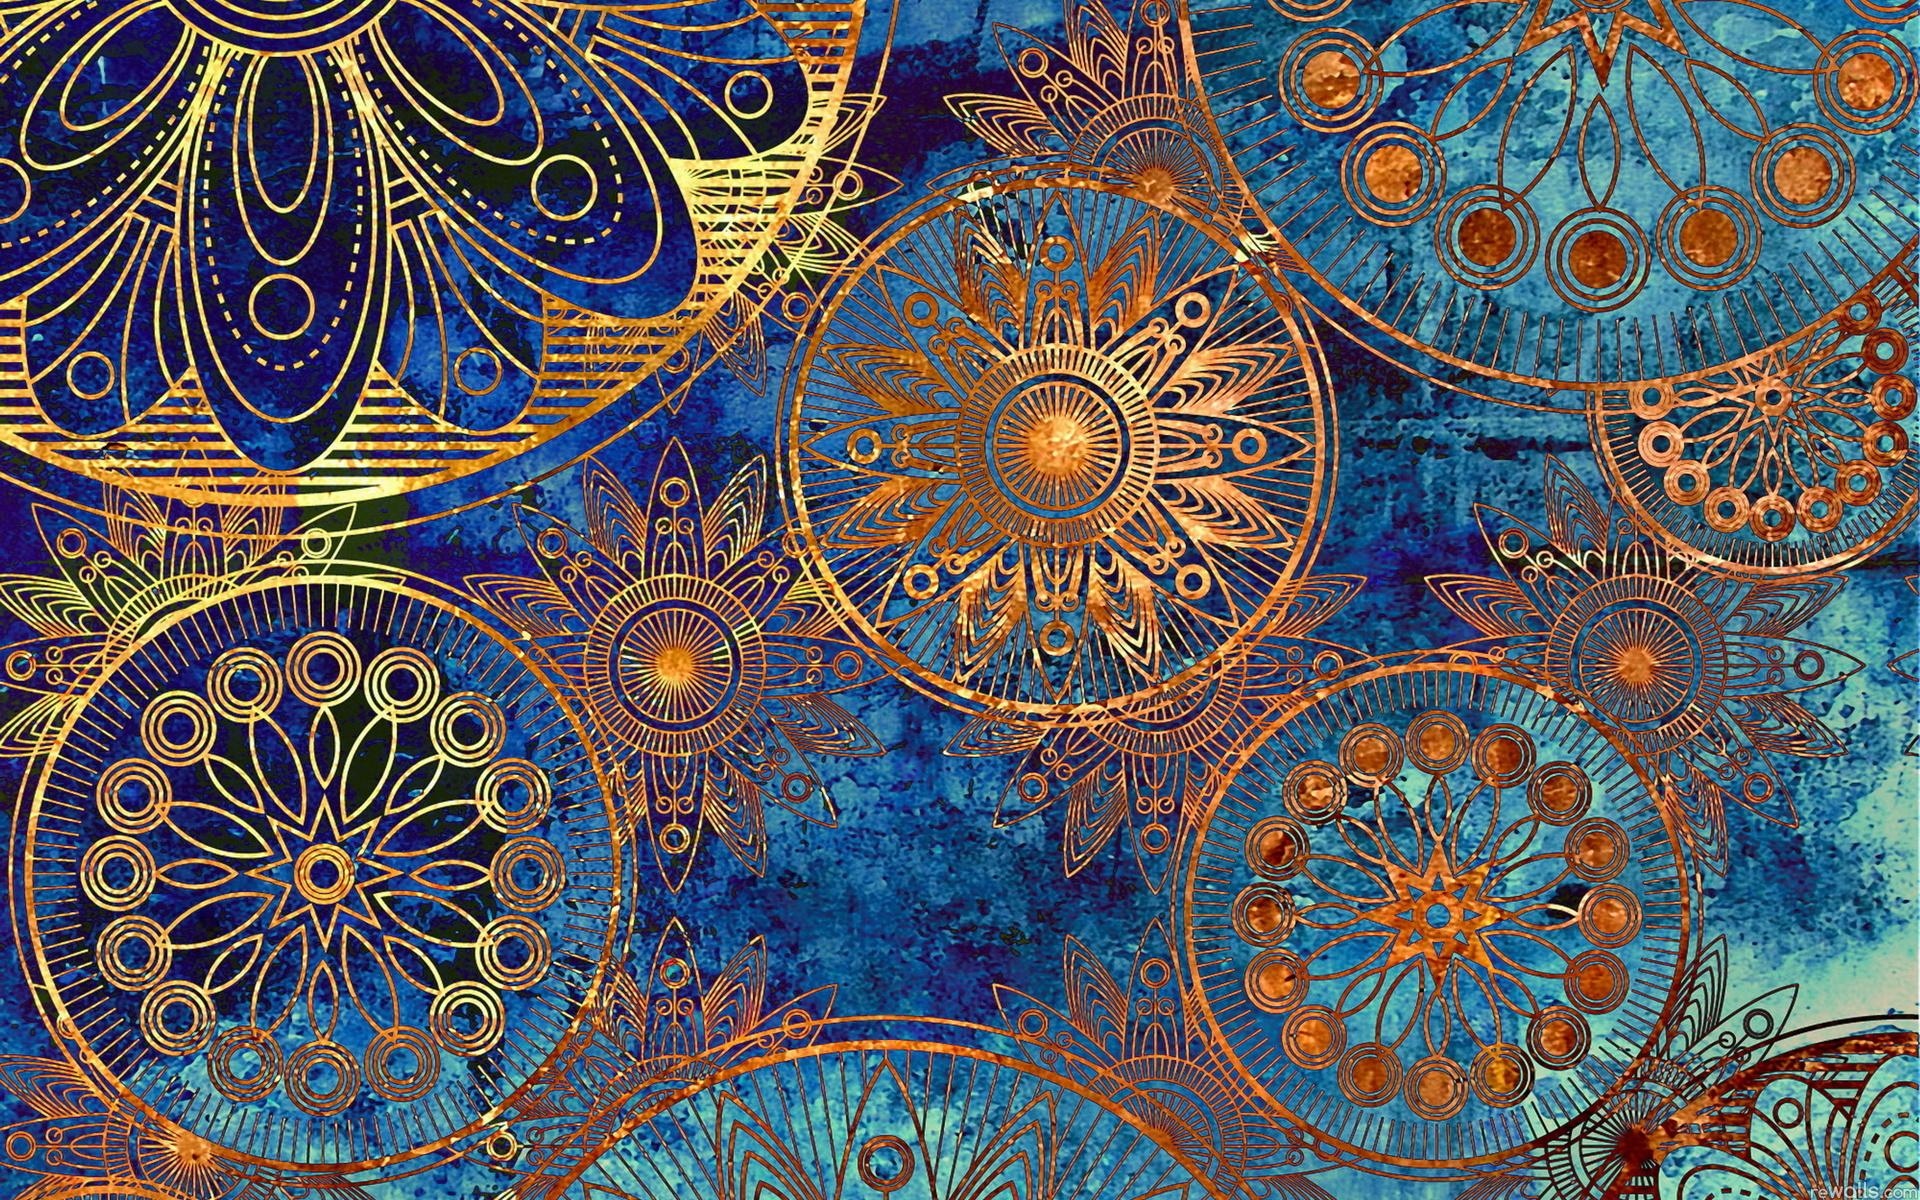 Wallpapers for Desktop wallpaper Vintage Wallpapers for Desktop 1920x1200